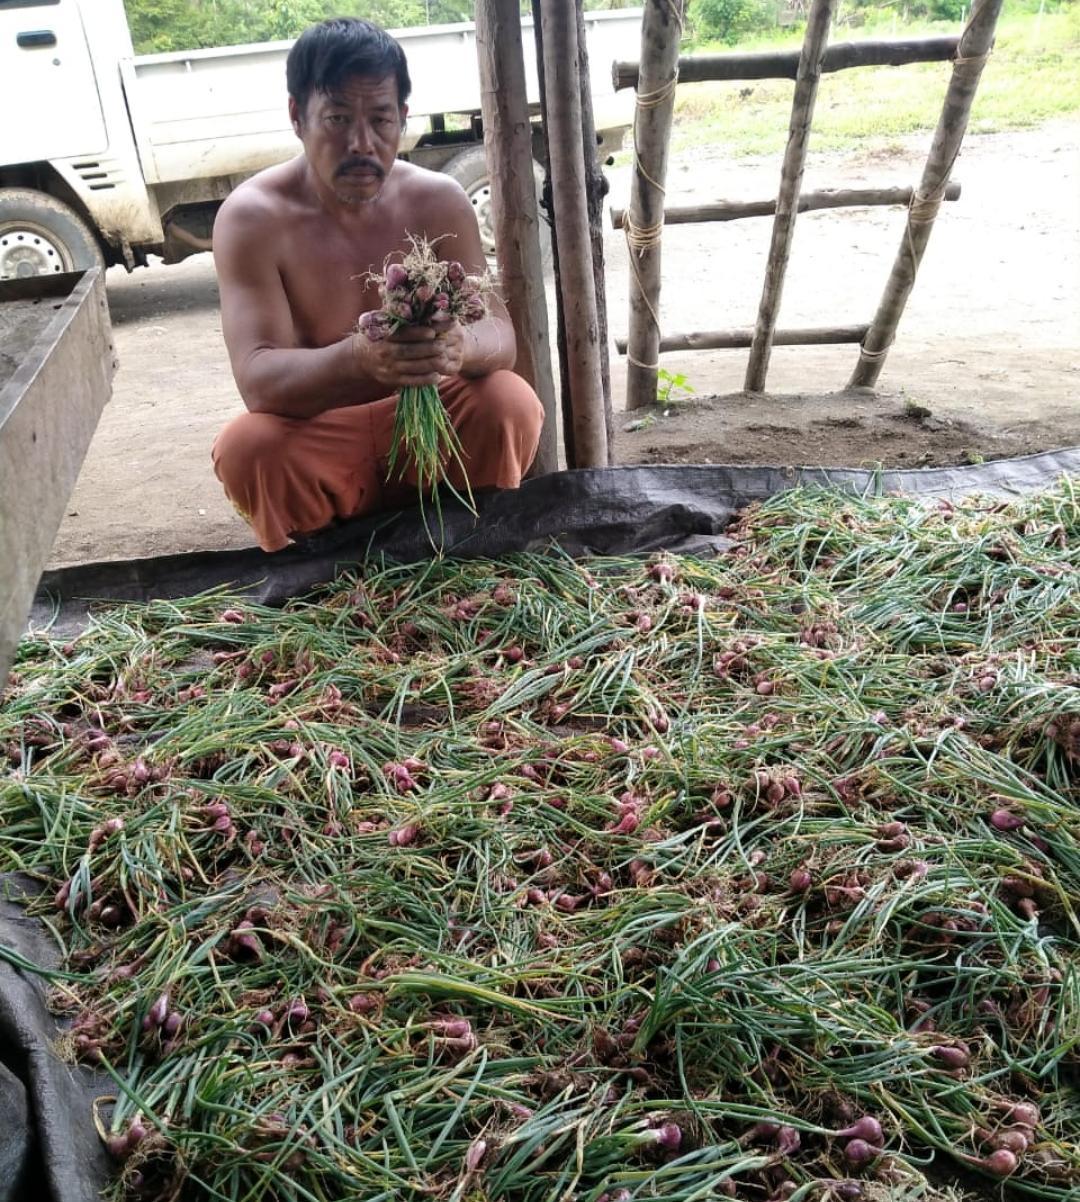 Penyuluh dan Petani Sukseskan Gerakan Ketahanan Pangan Melalui Panen Bawang di Kab. Tojo Una-Una